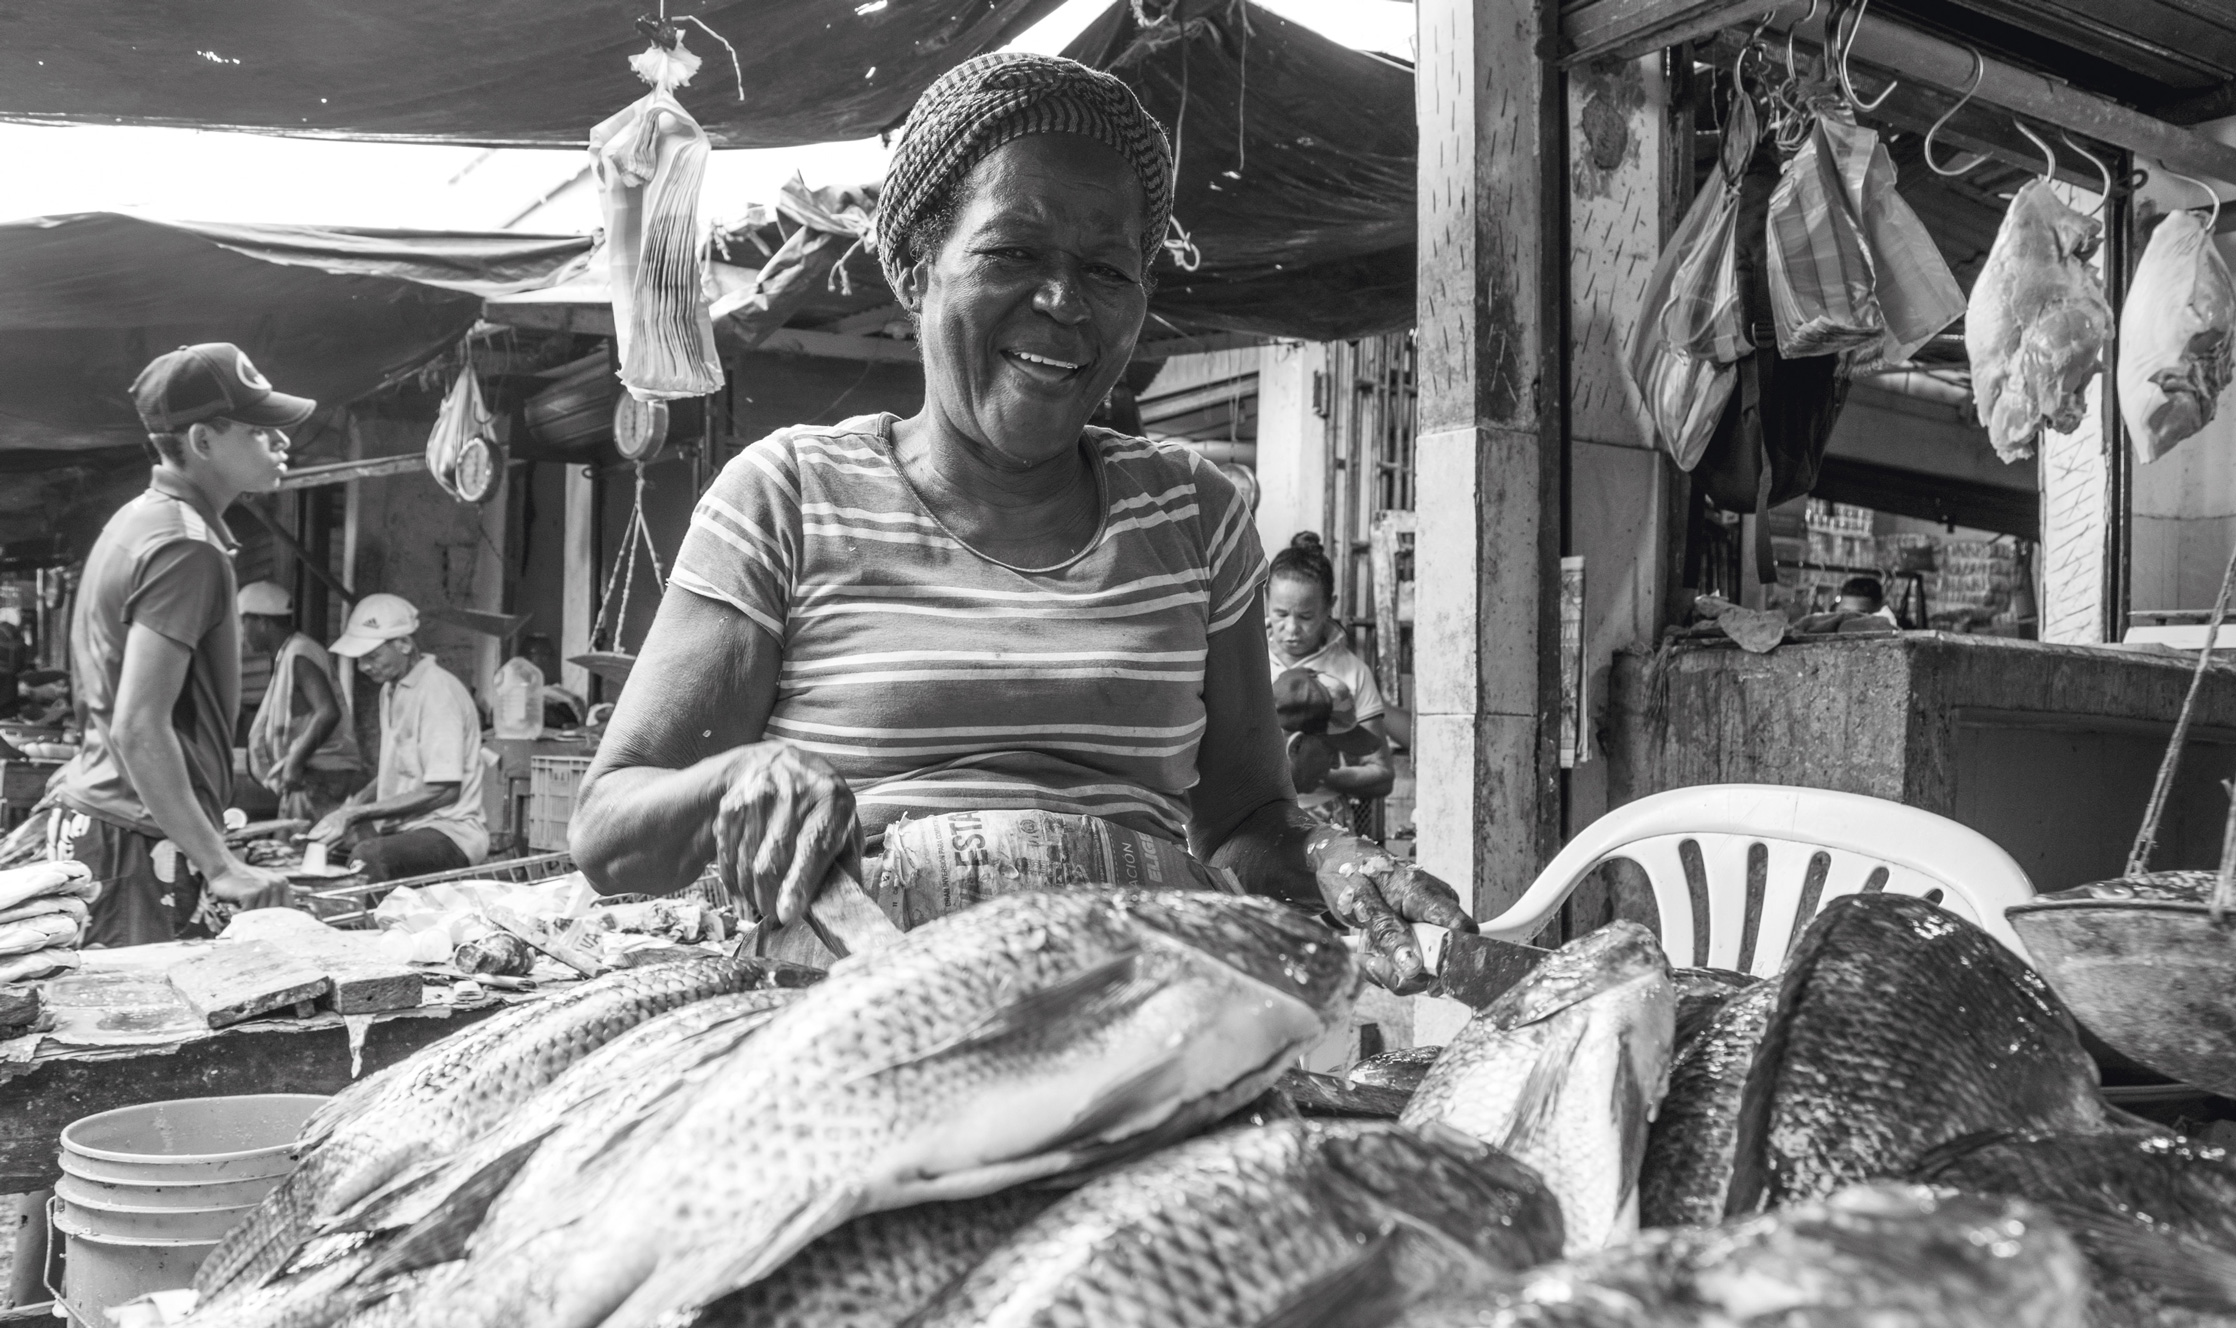 CARMEN Vendedora de pescado / Fishmonger